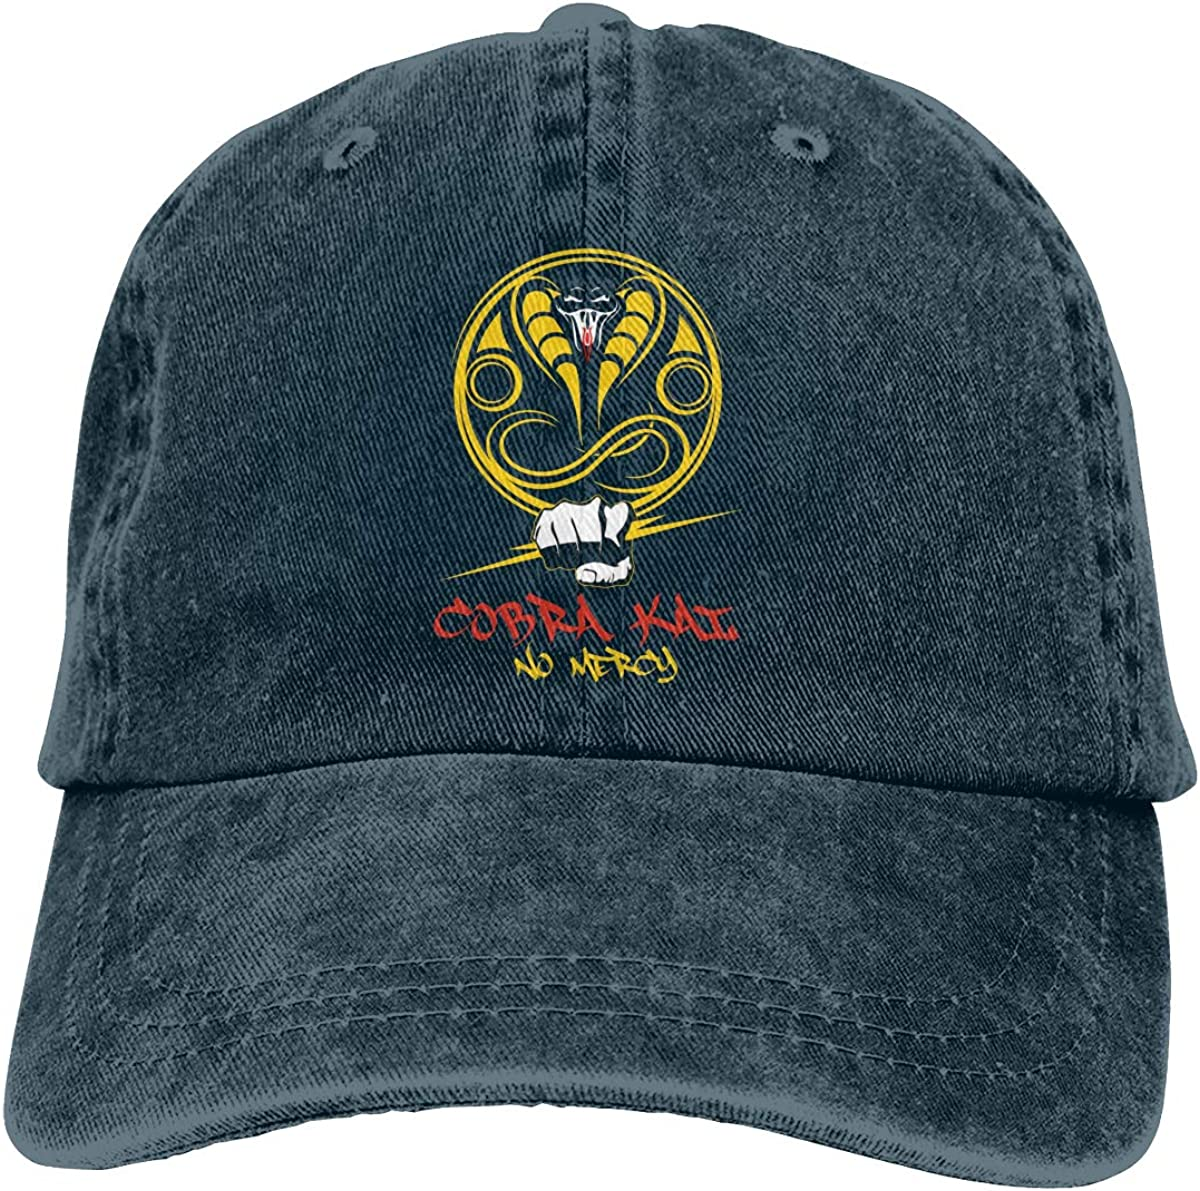 Cobra Kai 1984 Sweep The Leg Caps Sports Trucker Caps Pattern Strapback Hat for Men//Women